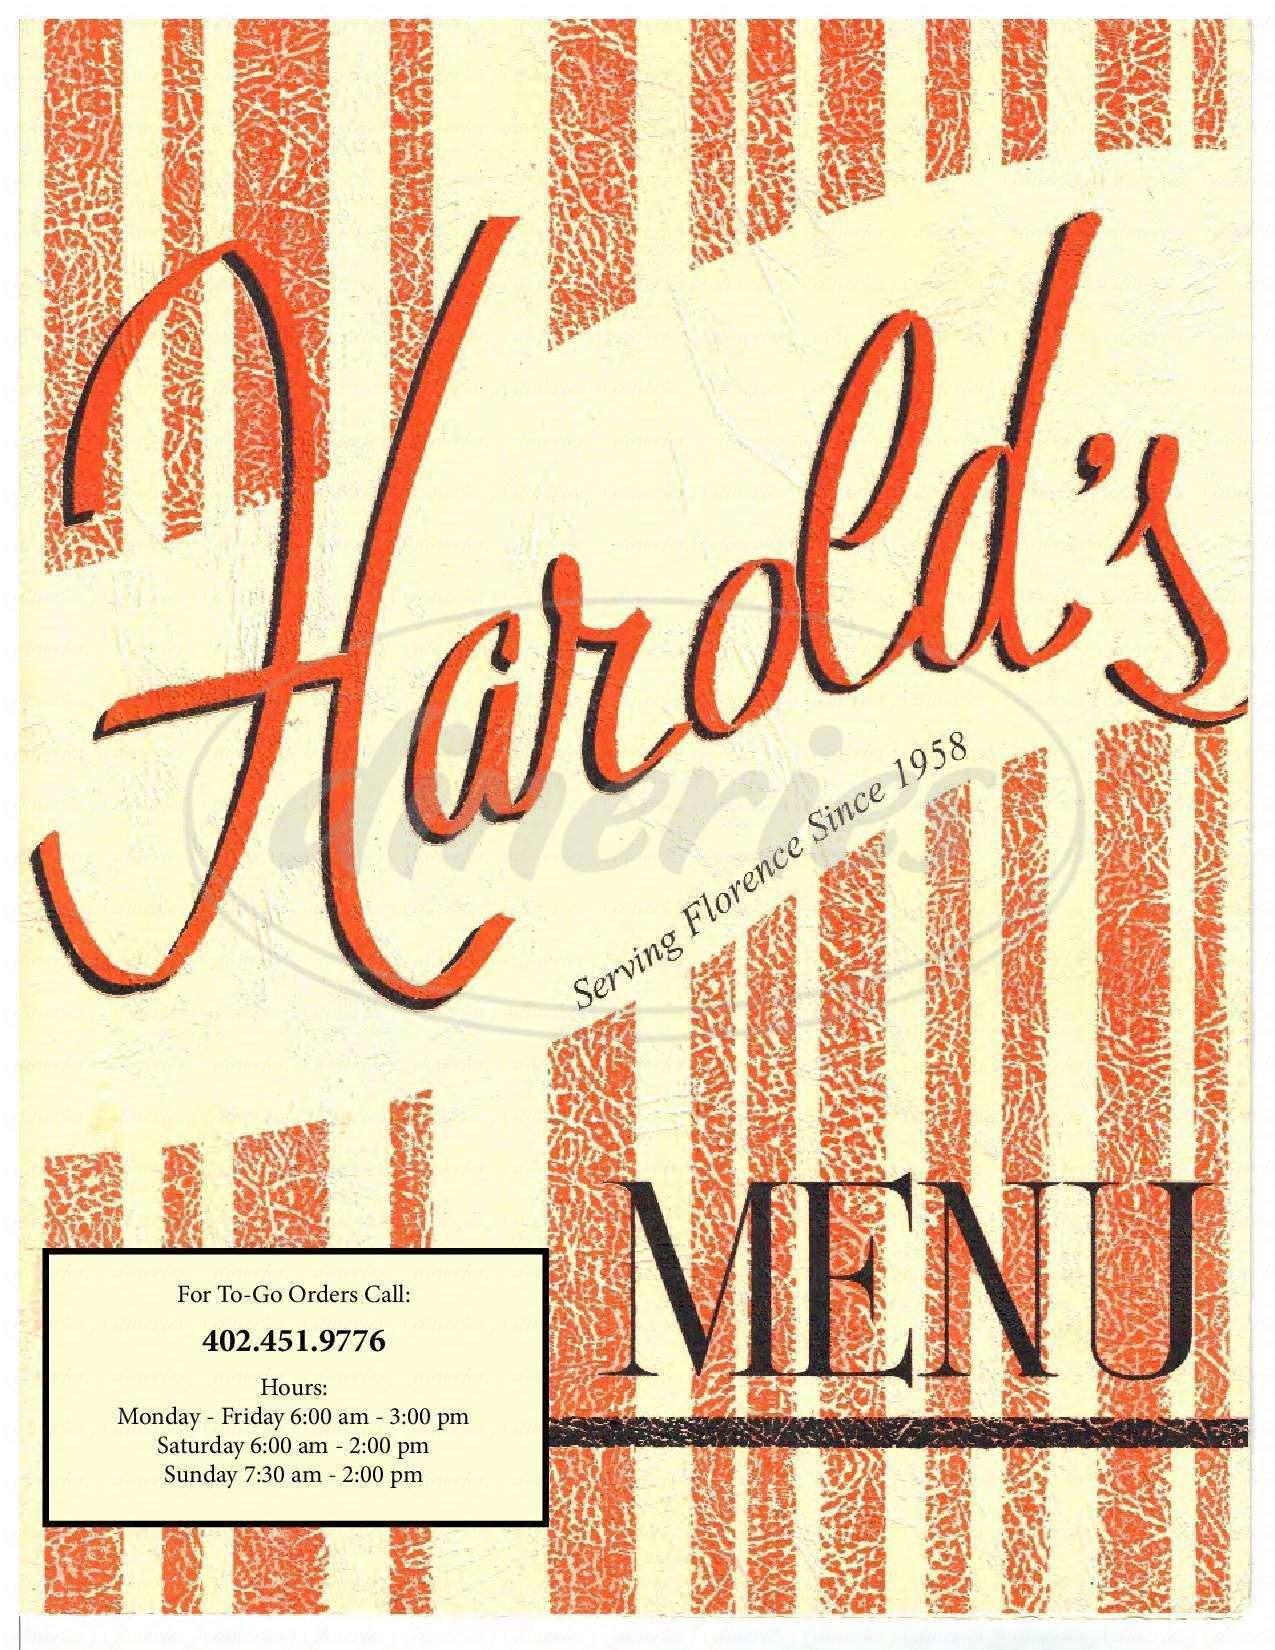 menu for Harold's Koffee House